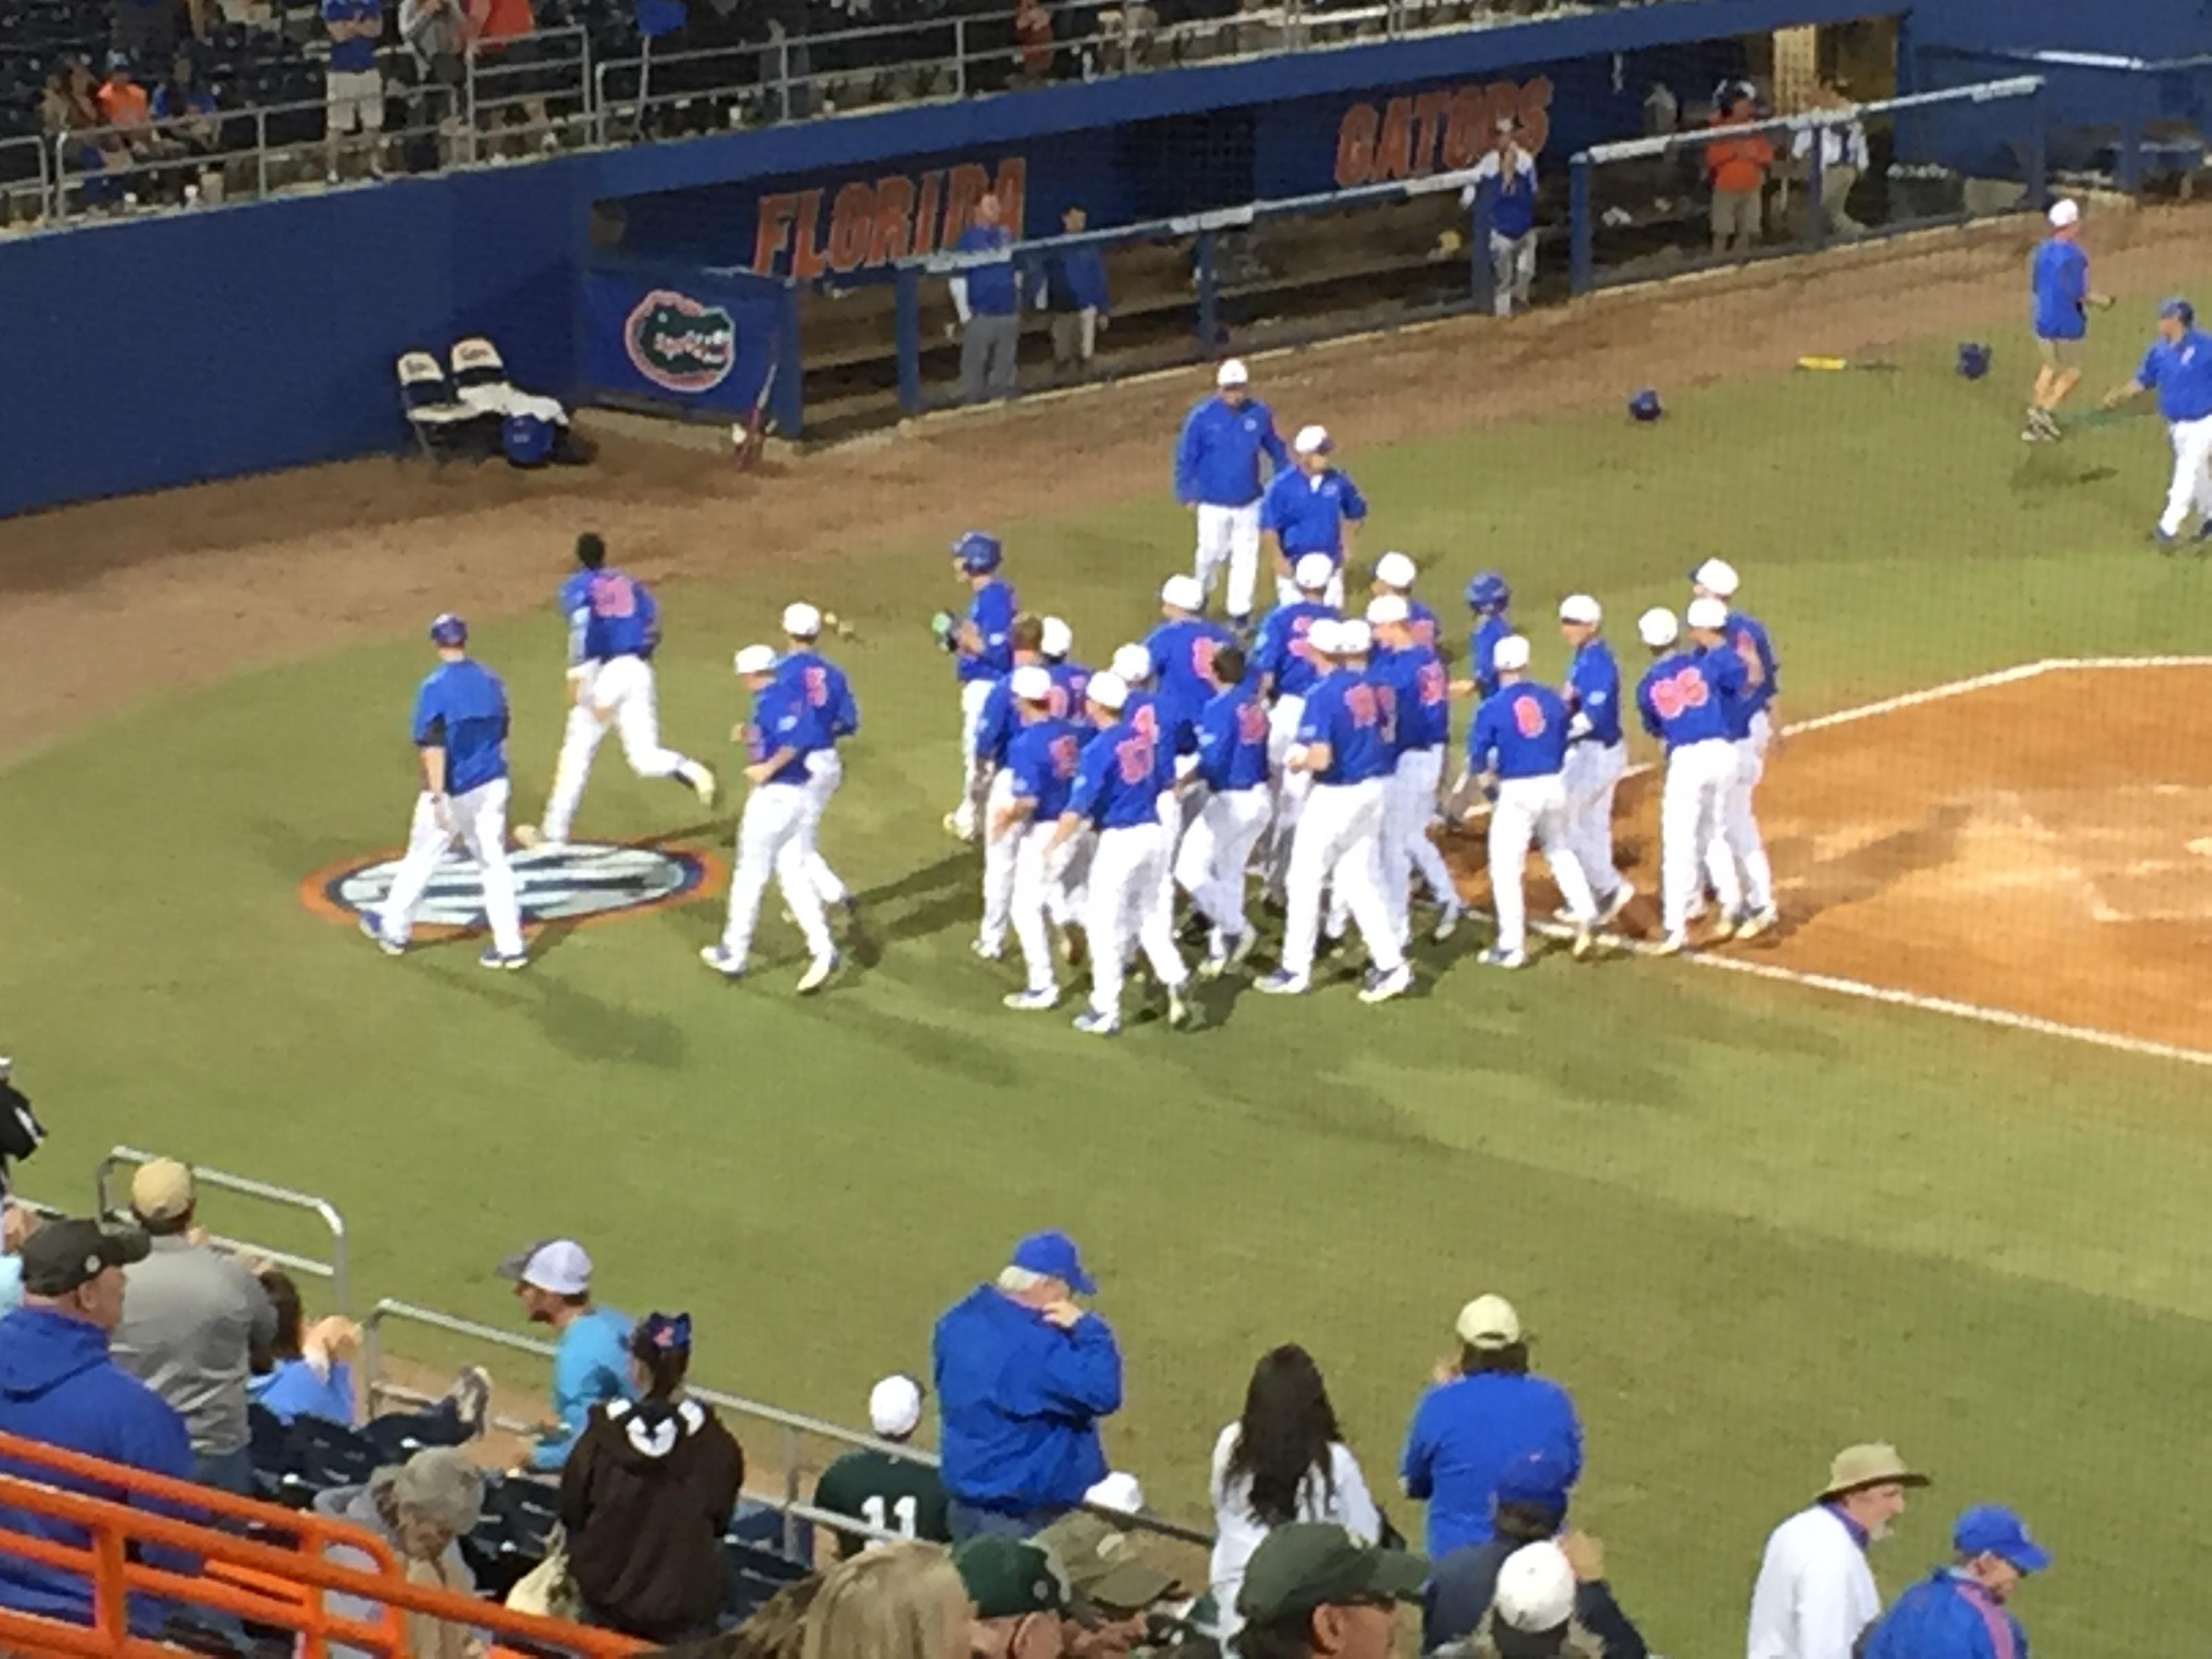 #1 Gators Walk Off to Win Series